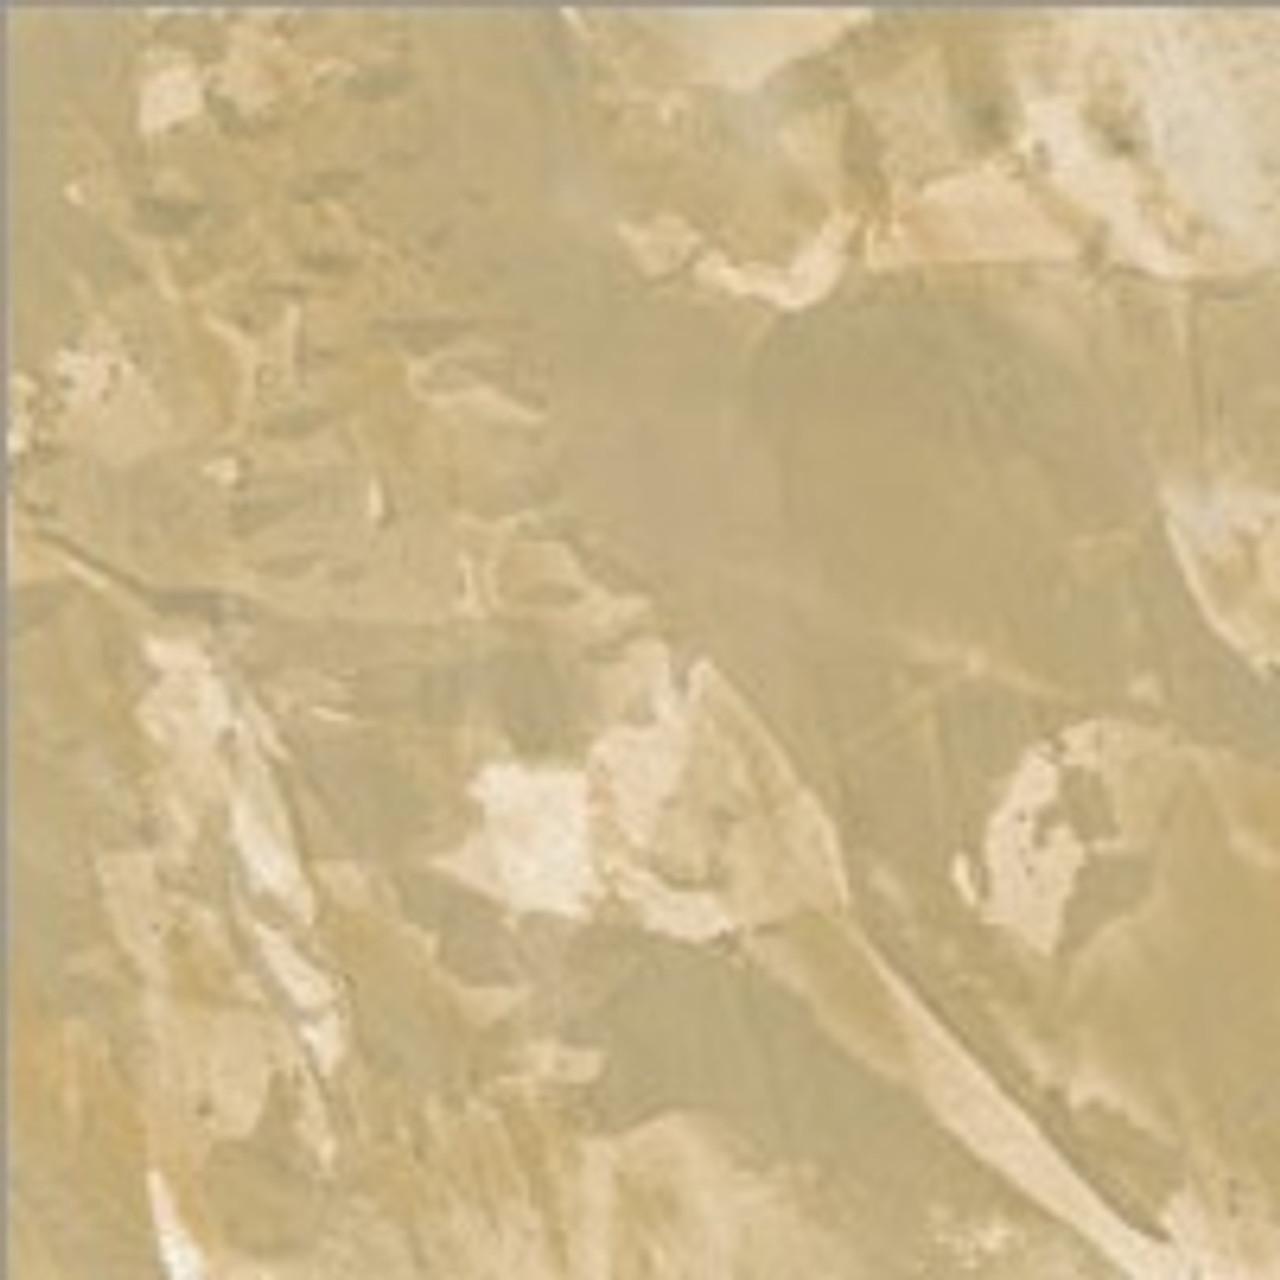 DuRock ST 500 Smoothrock Venetian Plaster (White Polished Topcoat)